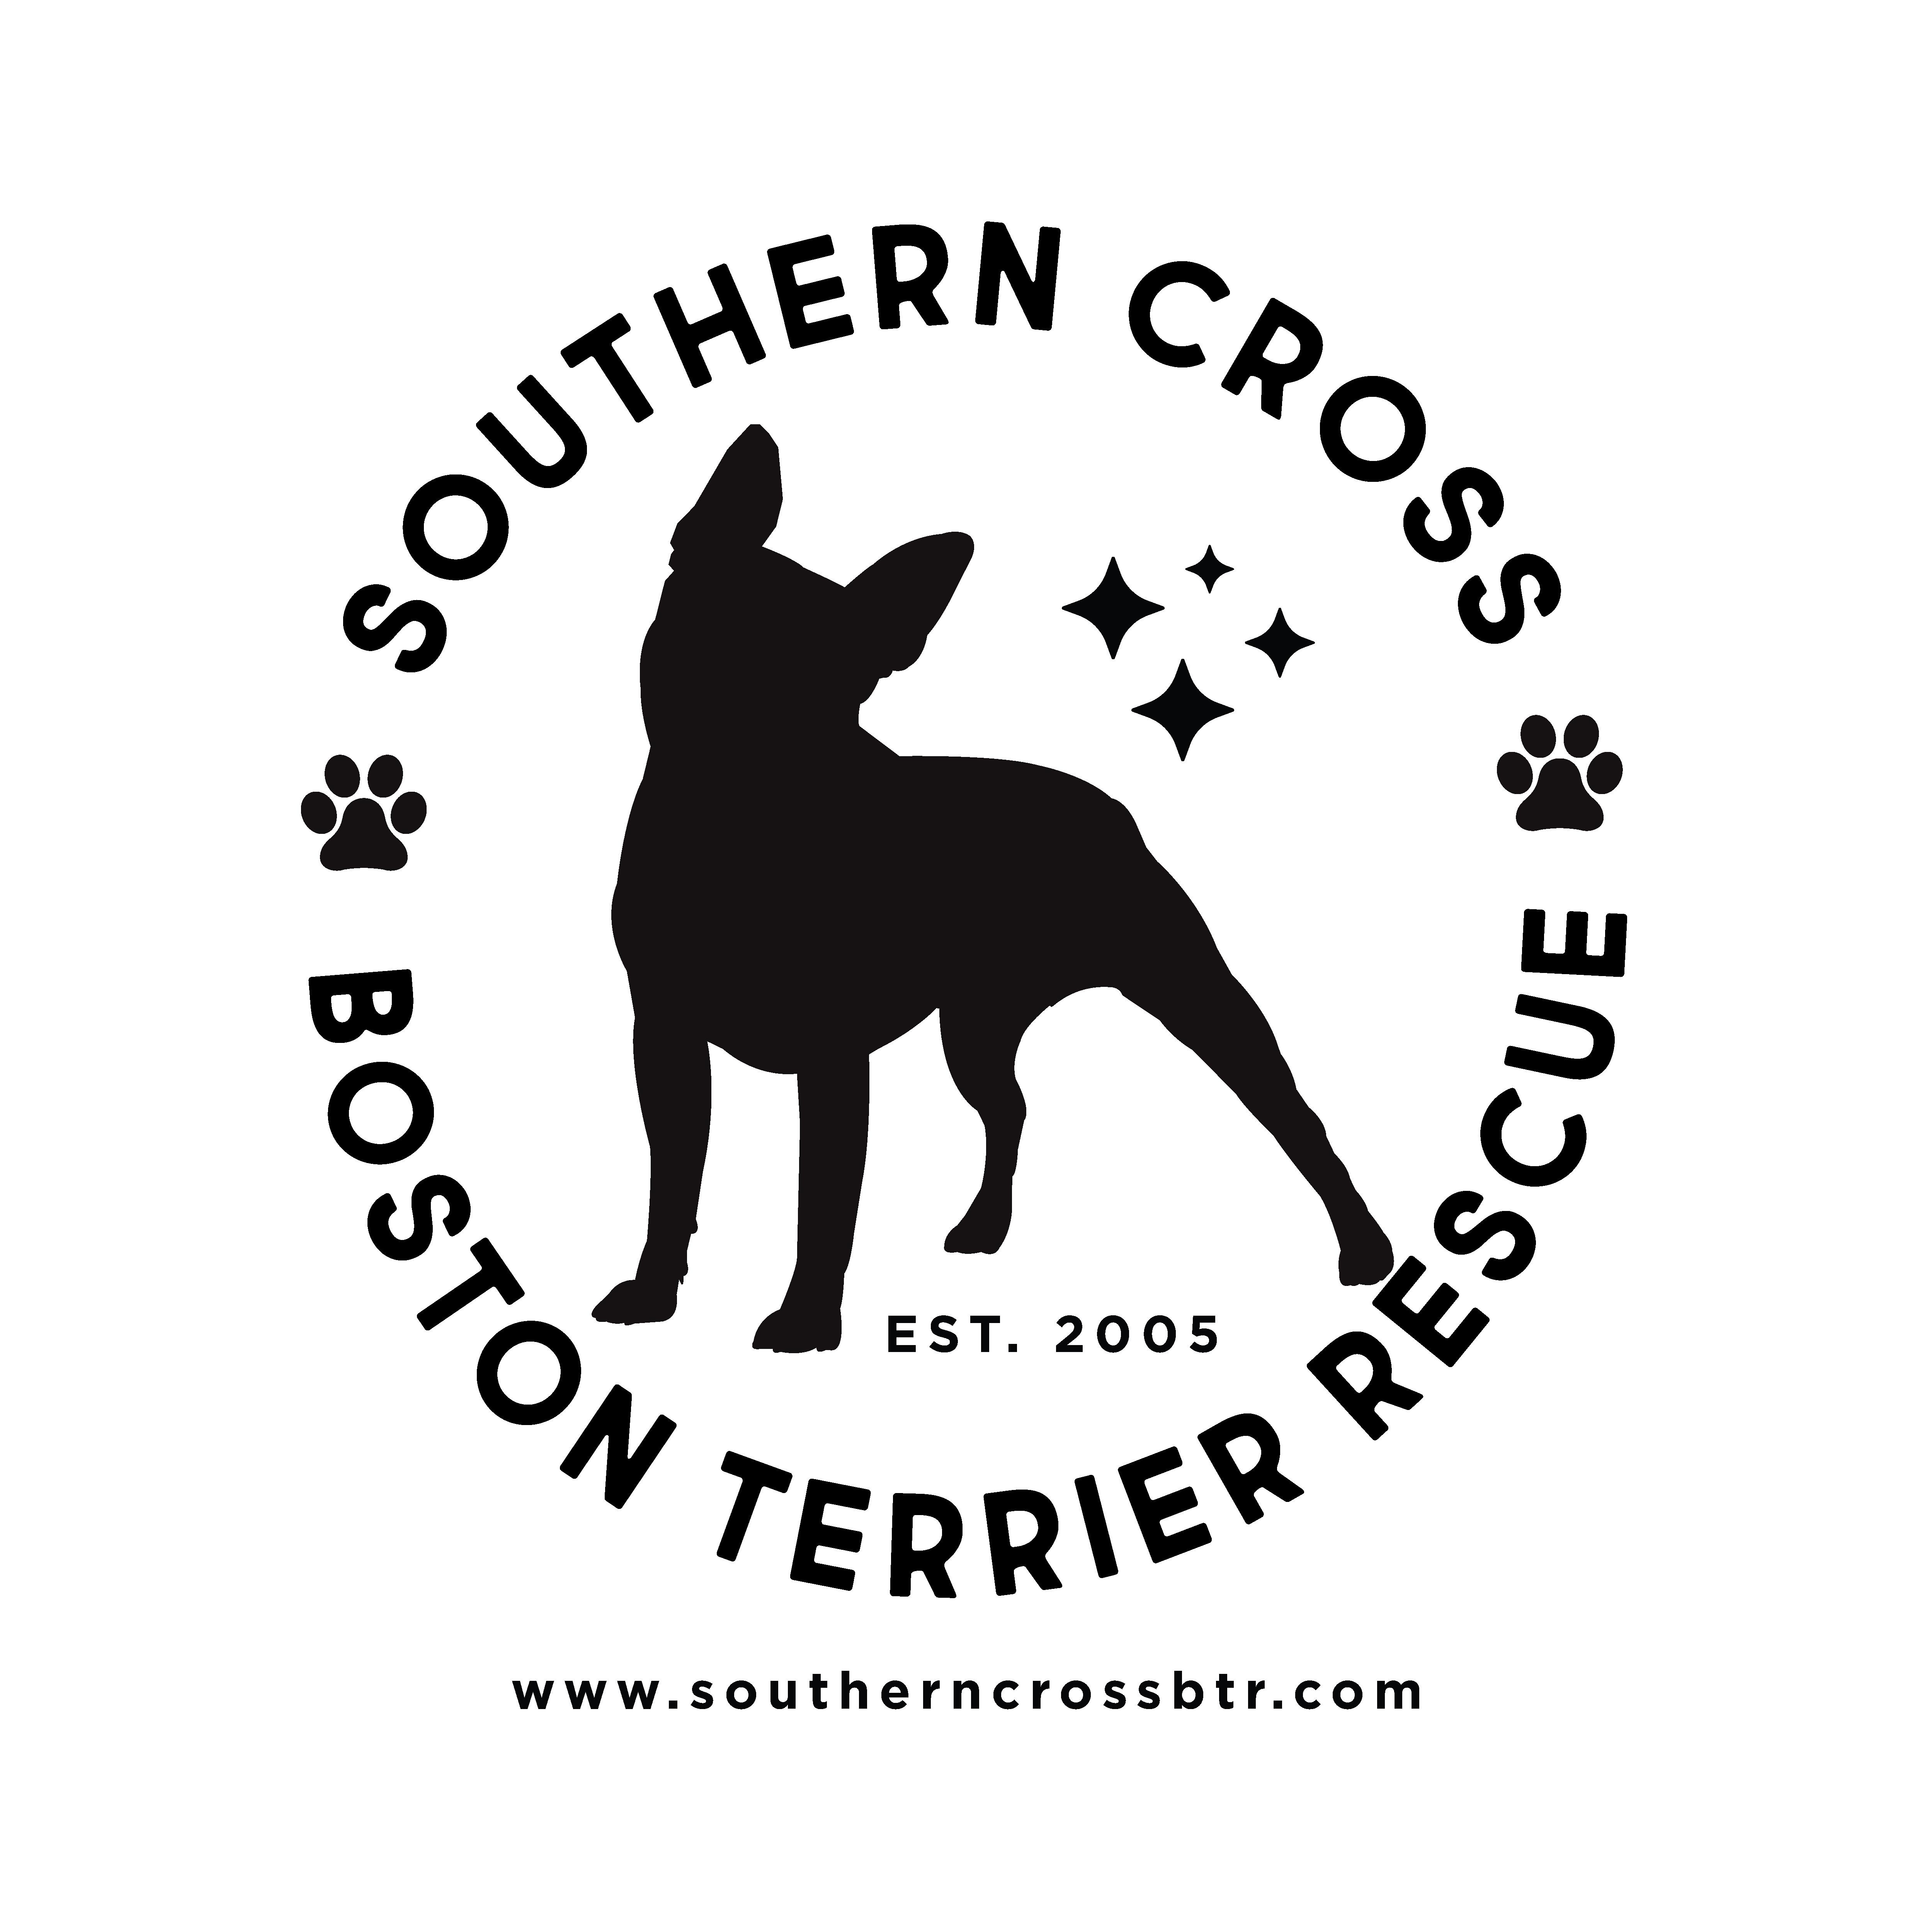 Southern Cross Boston Terrier Rescue